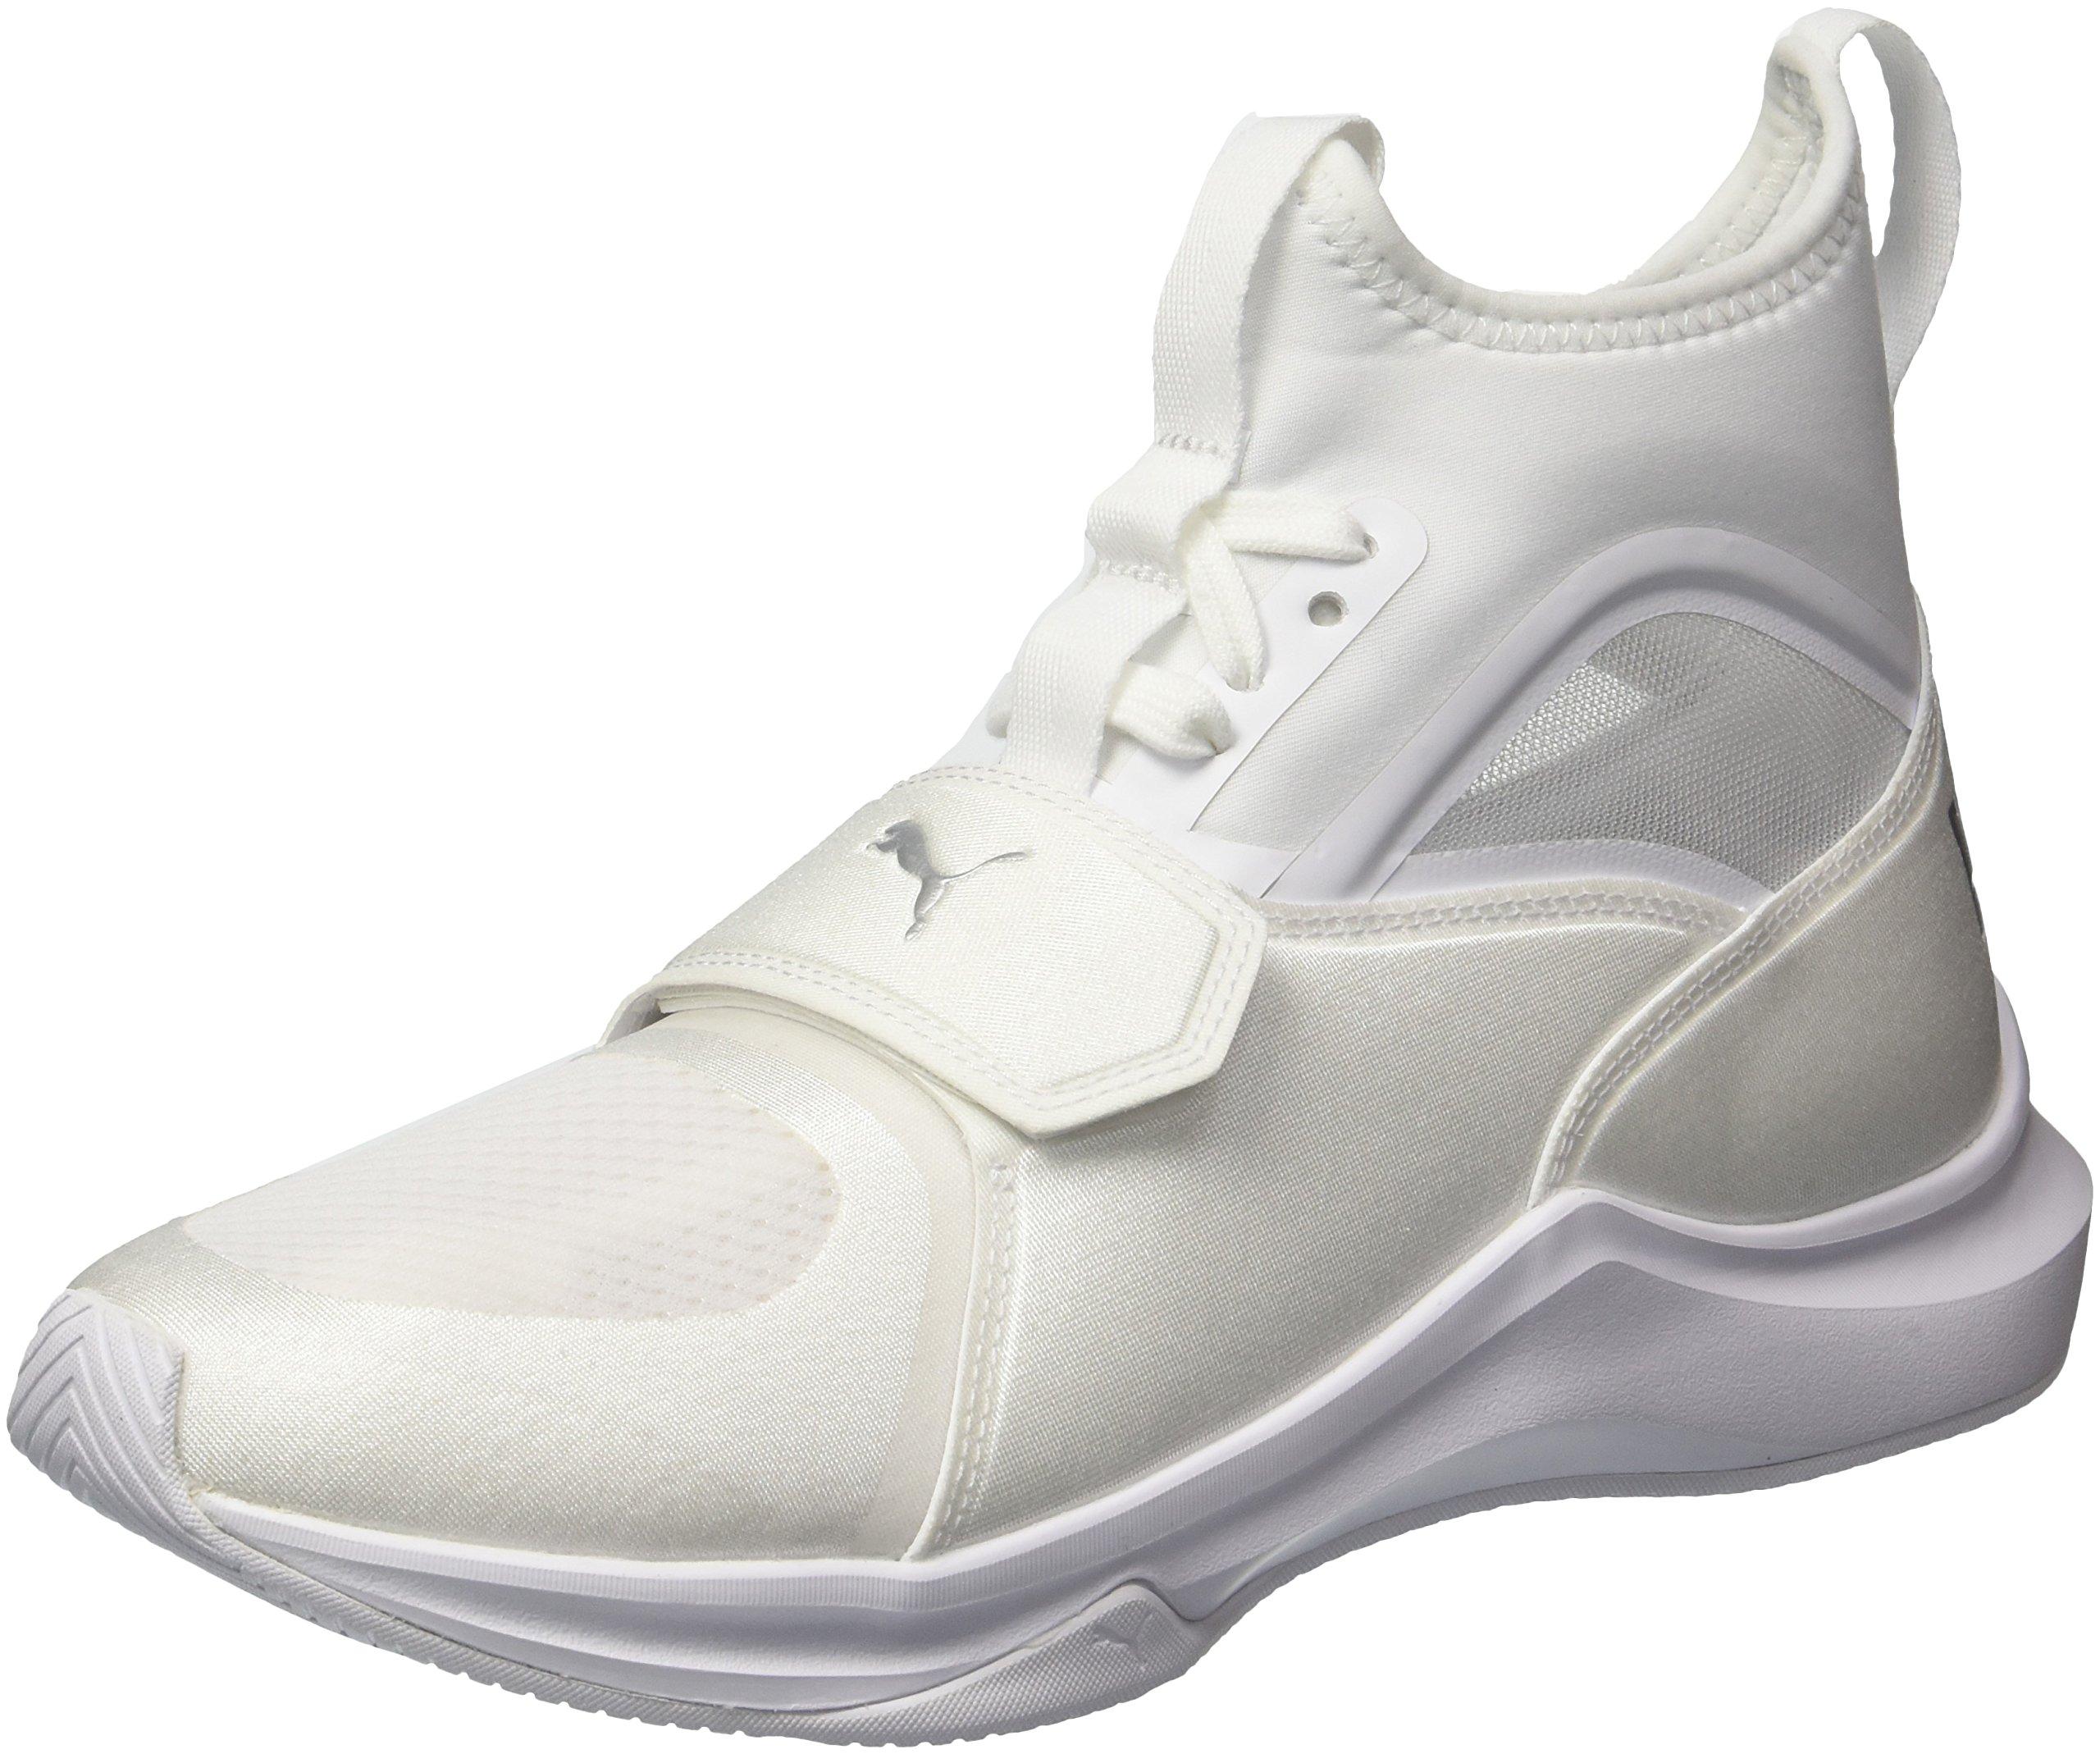 PUMA Women's Phenom Wn Sneaker, White White, 9 M US